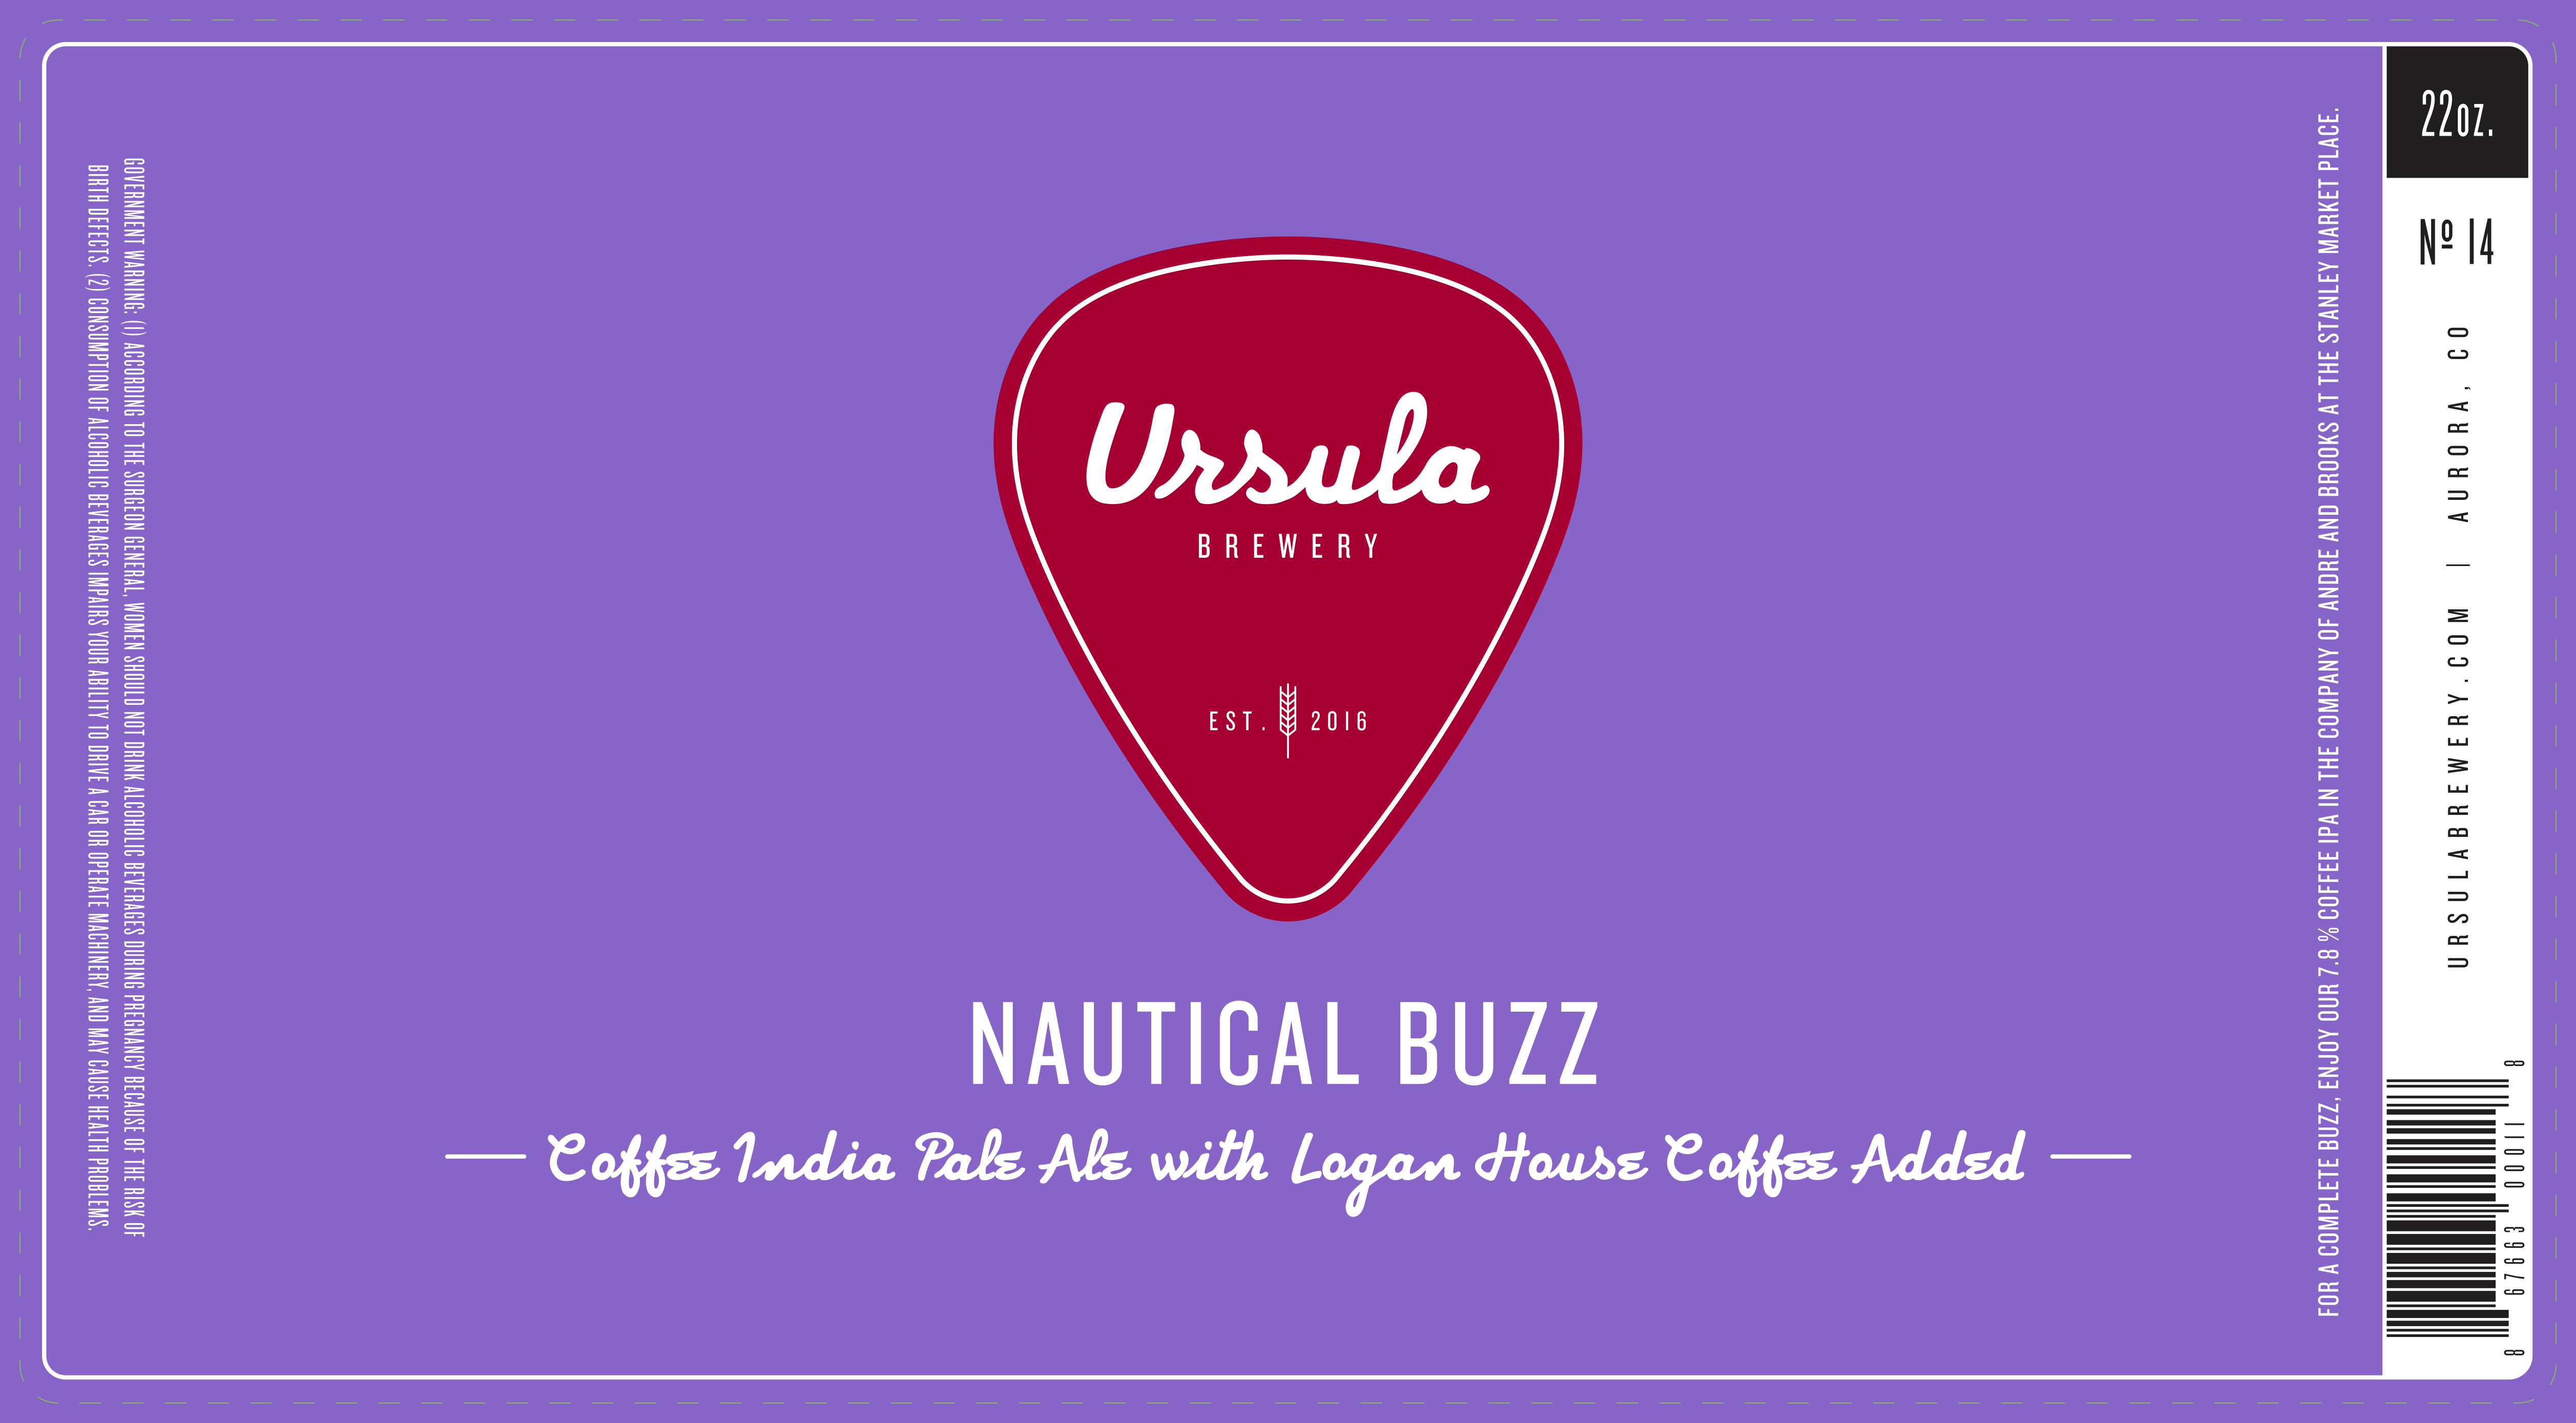 Nautical Buzz | Ursula Brewery | Aurora Colorado Brewery